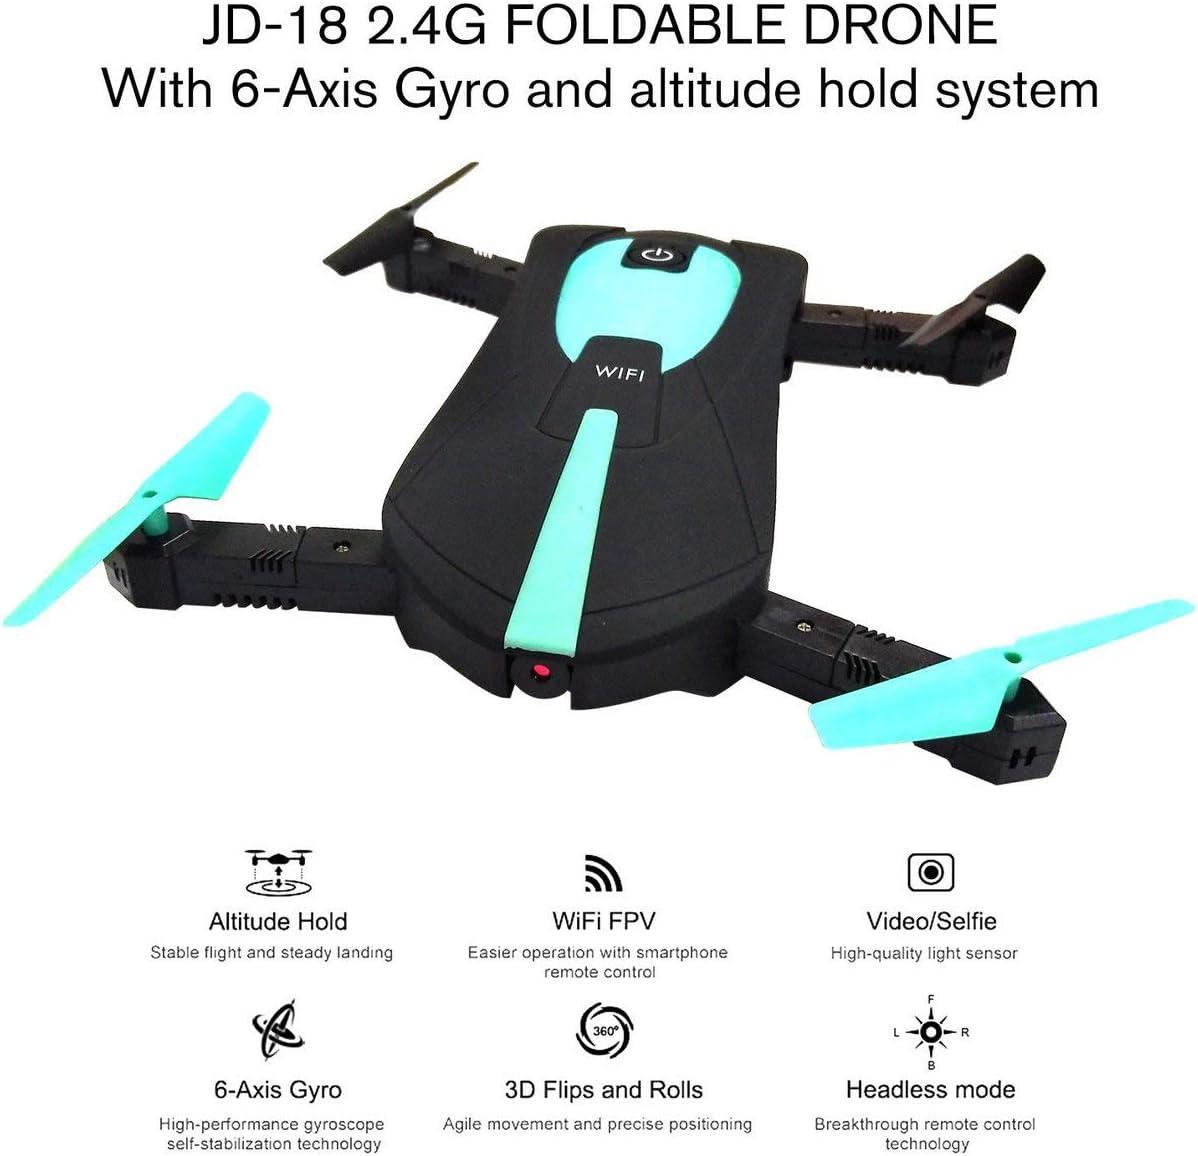 Dailyinshop JD-18 2.4G LAN FPV 200W Kamera faltbare 6-Achsen-Gyro ...